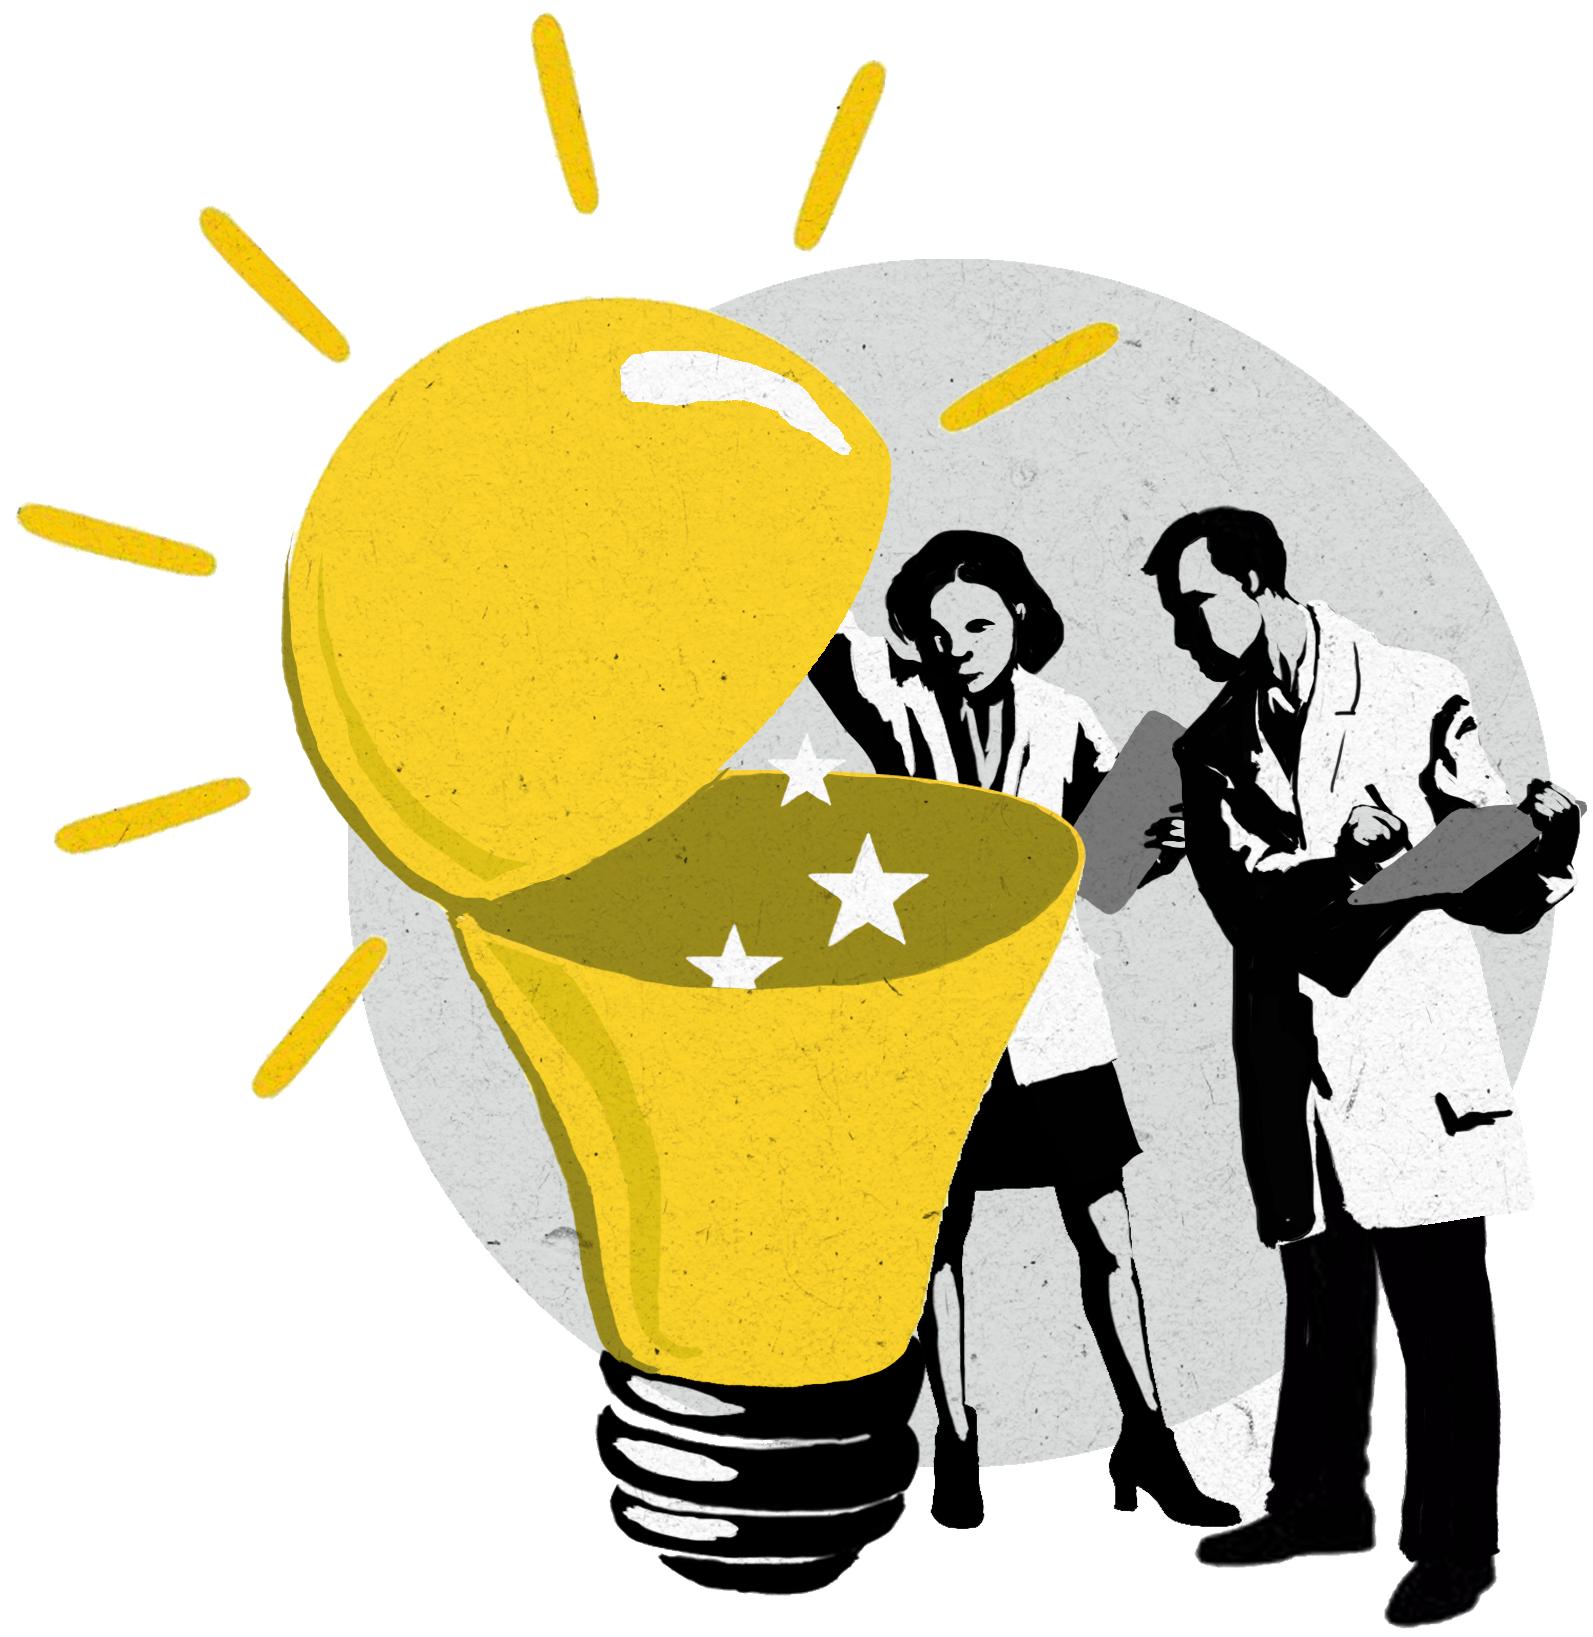 Двое человек открывают большую лампочку (State Dept./D. Thompson)